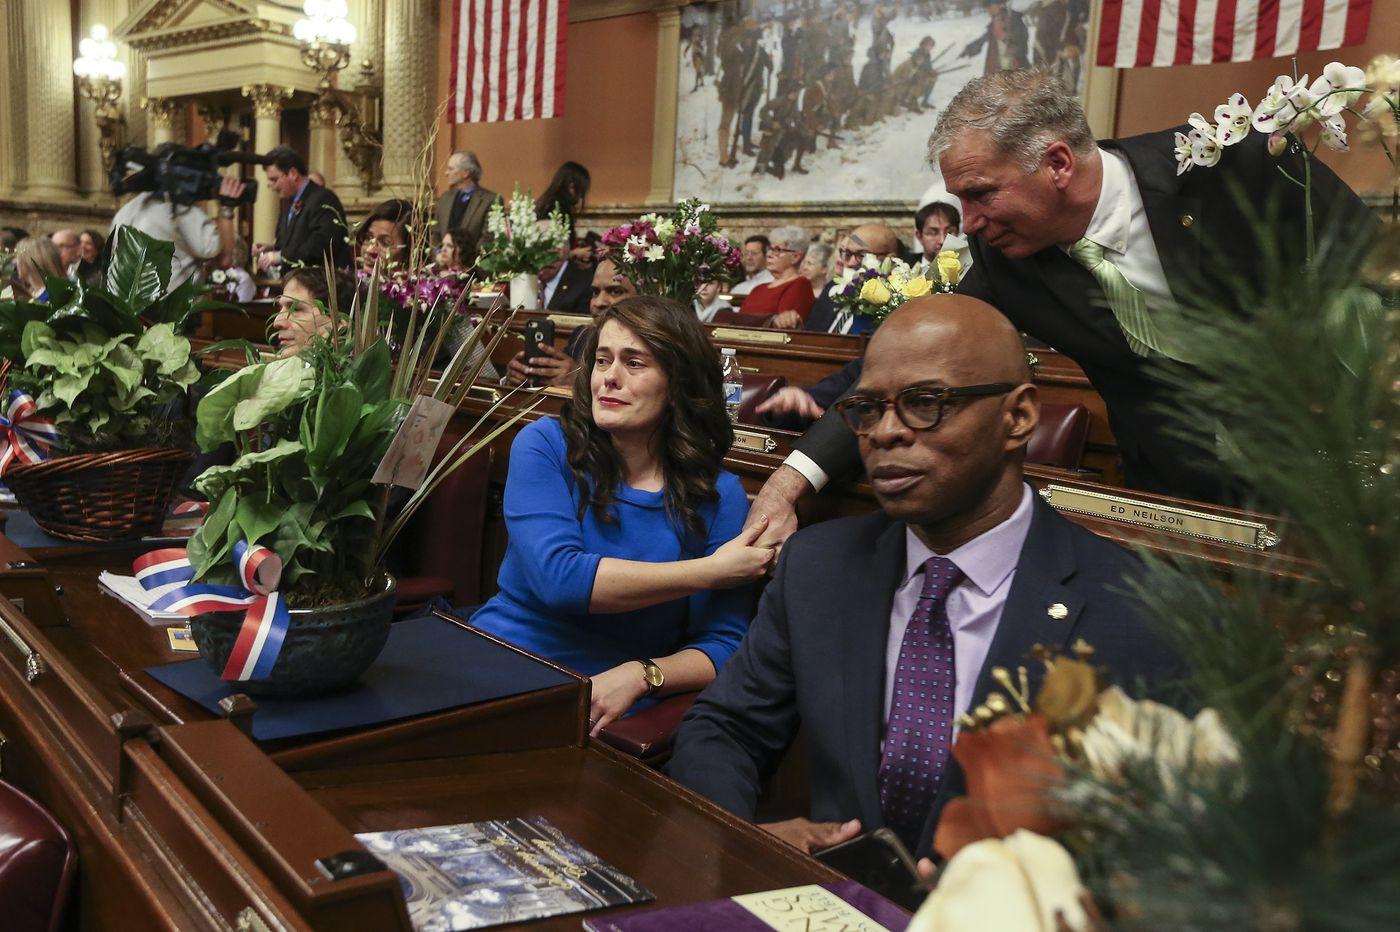 More Democrats, more women — but the GOP still rules in Pa. legislature